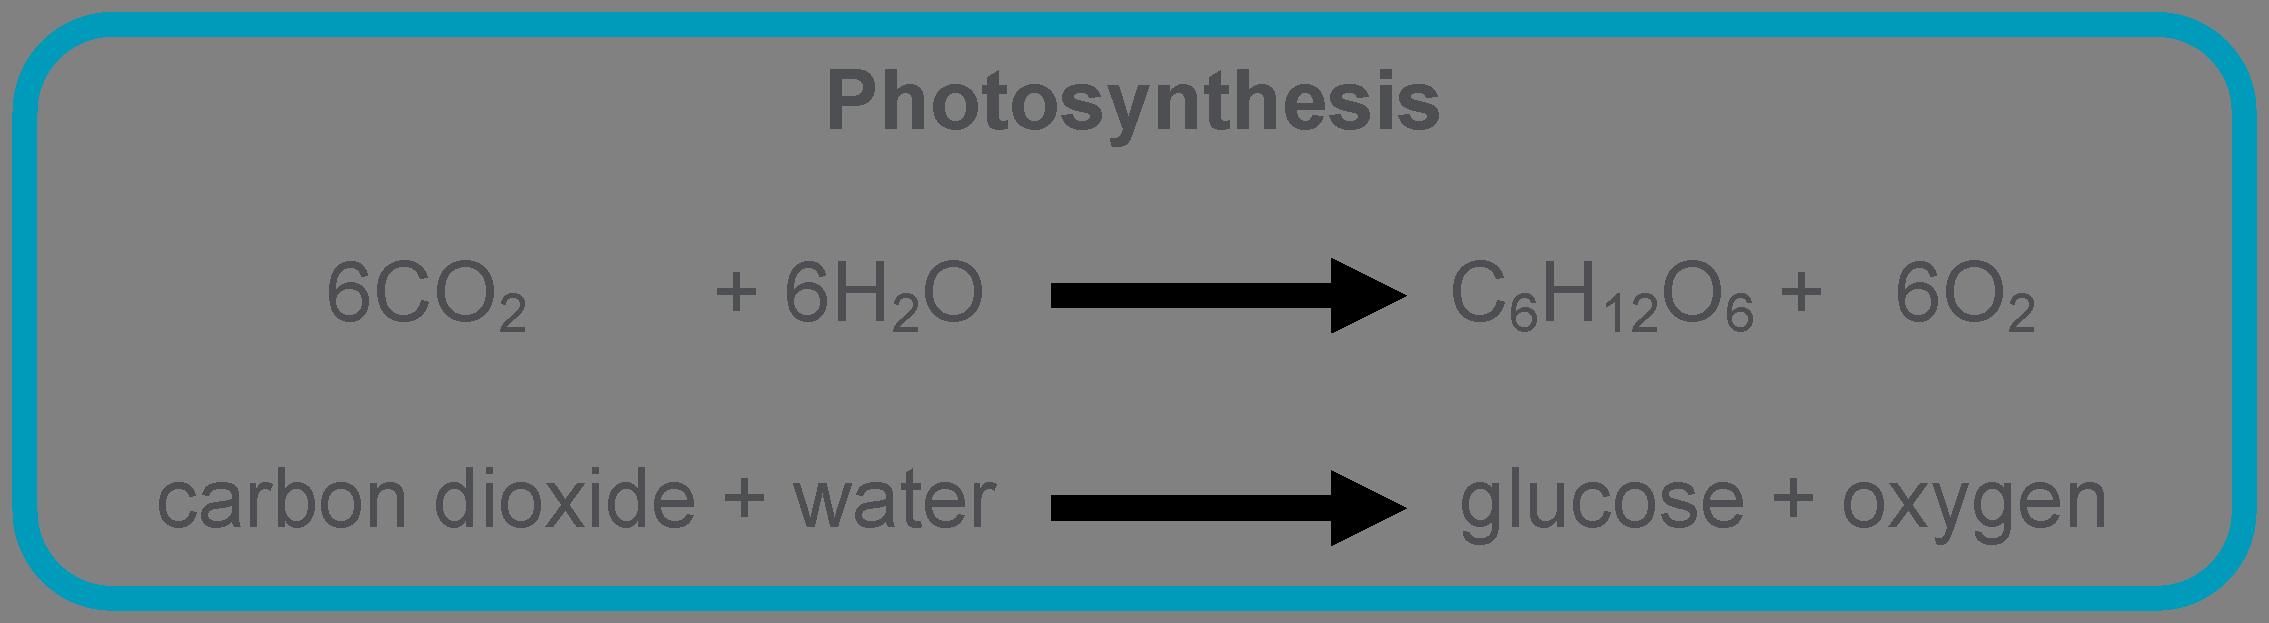 http://biotech4you.com/biotech-notes/plant-biotech/59-photosynthesis